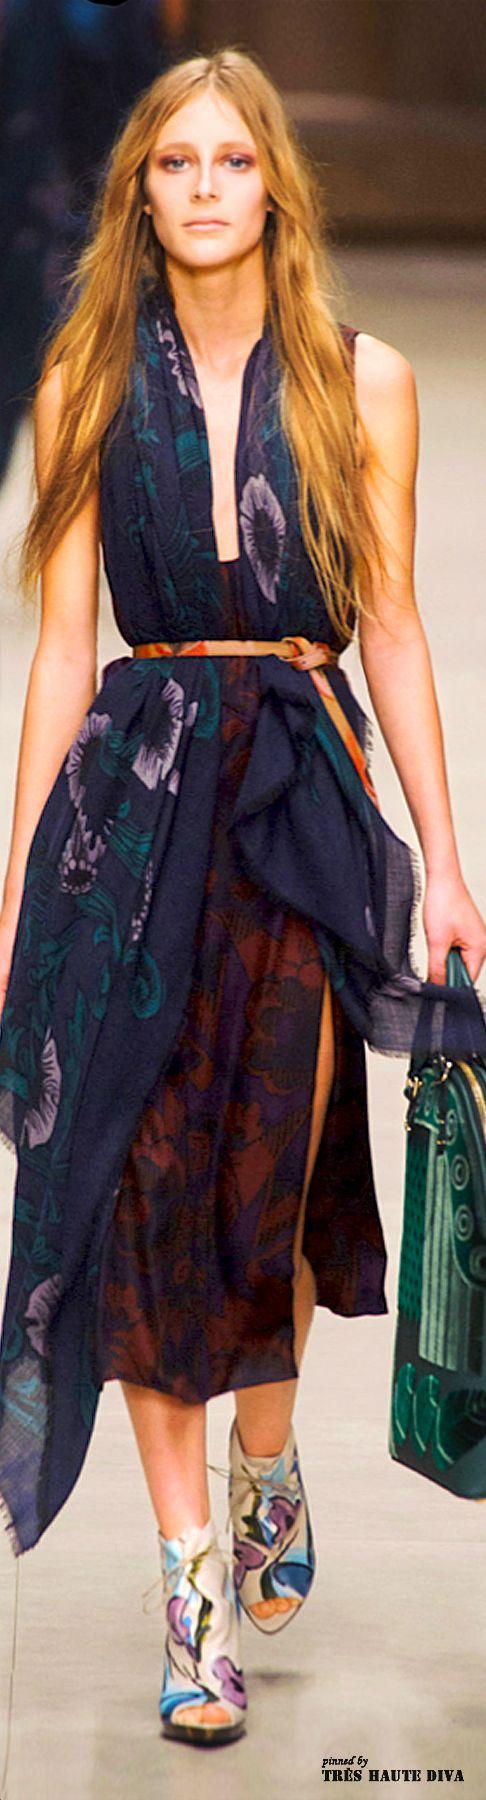 London Fashion Week Burberry Prorsum Fall 2014   The House of Beccaria